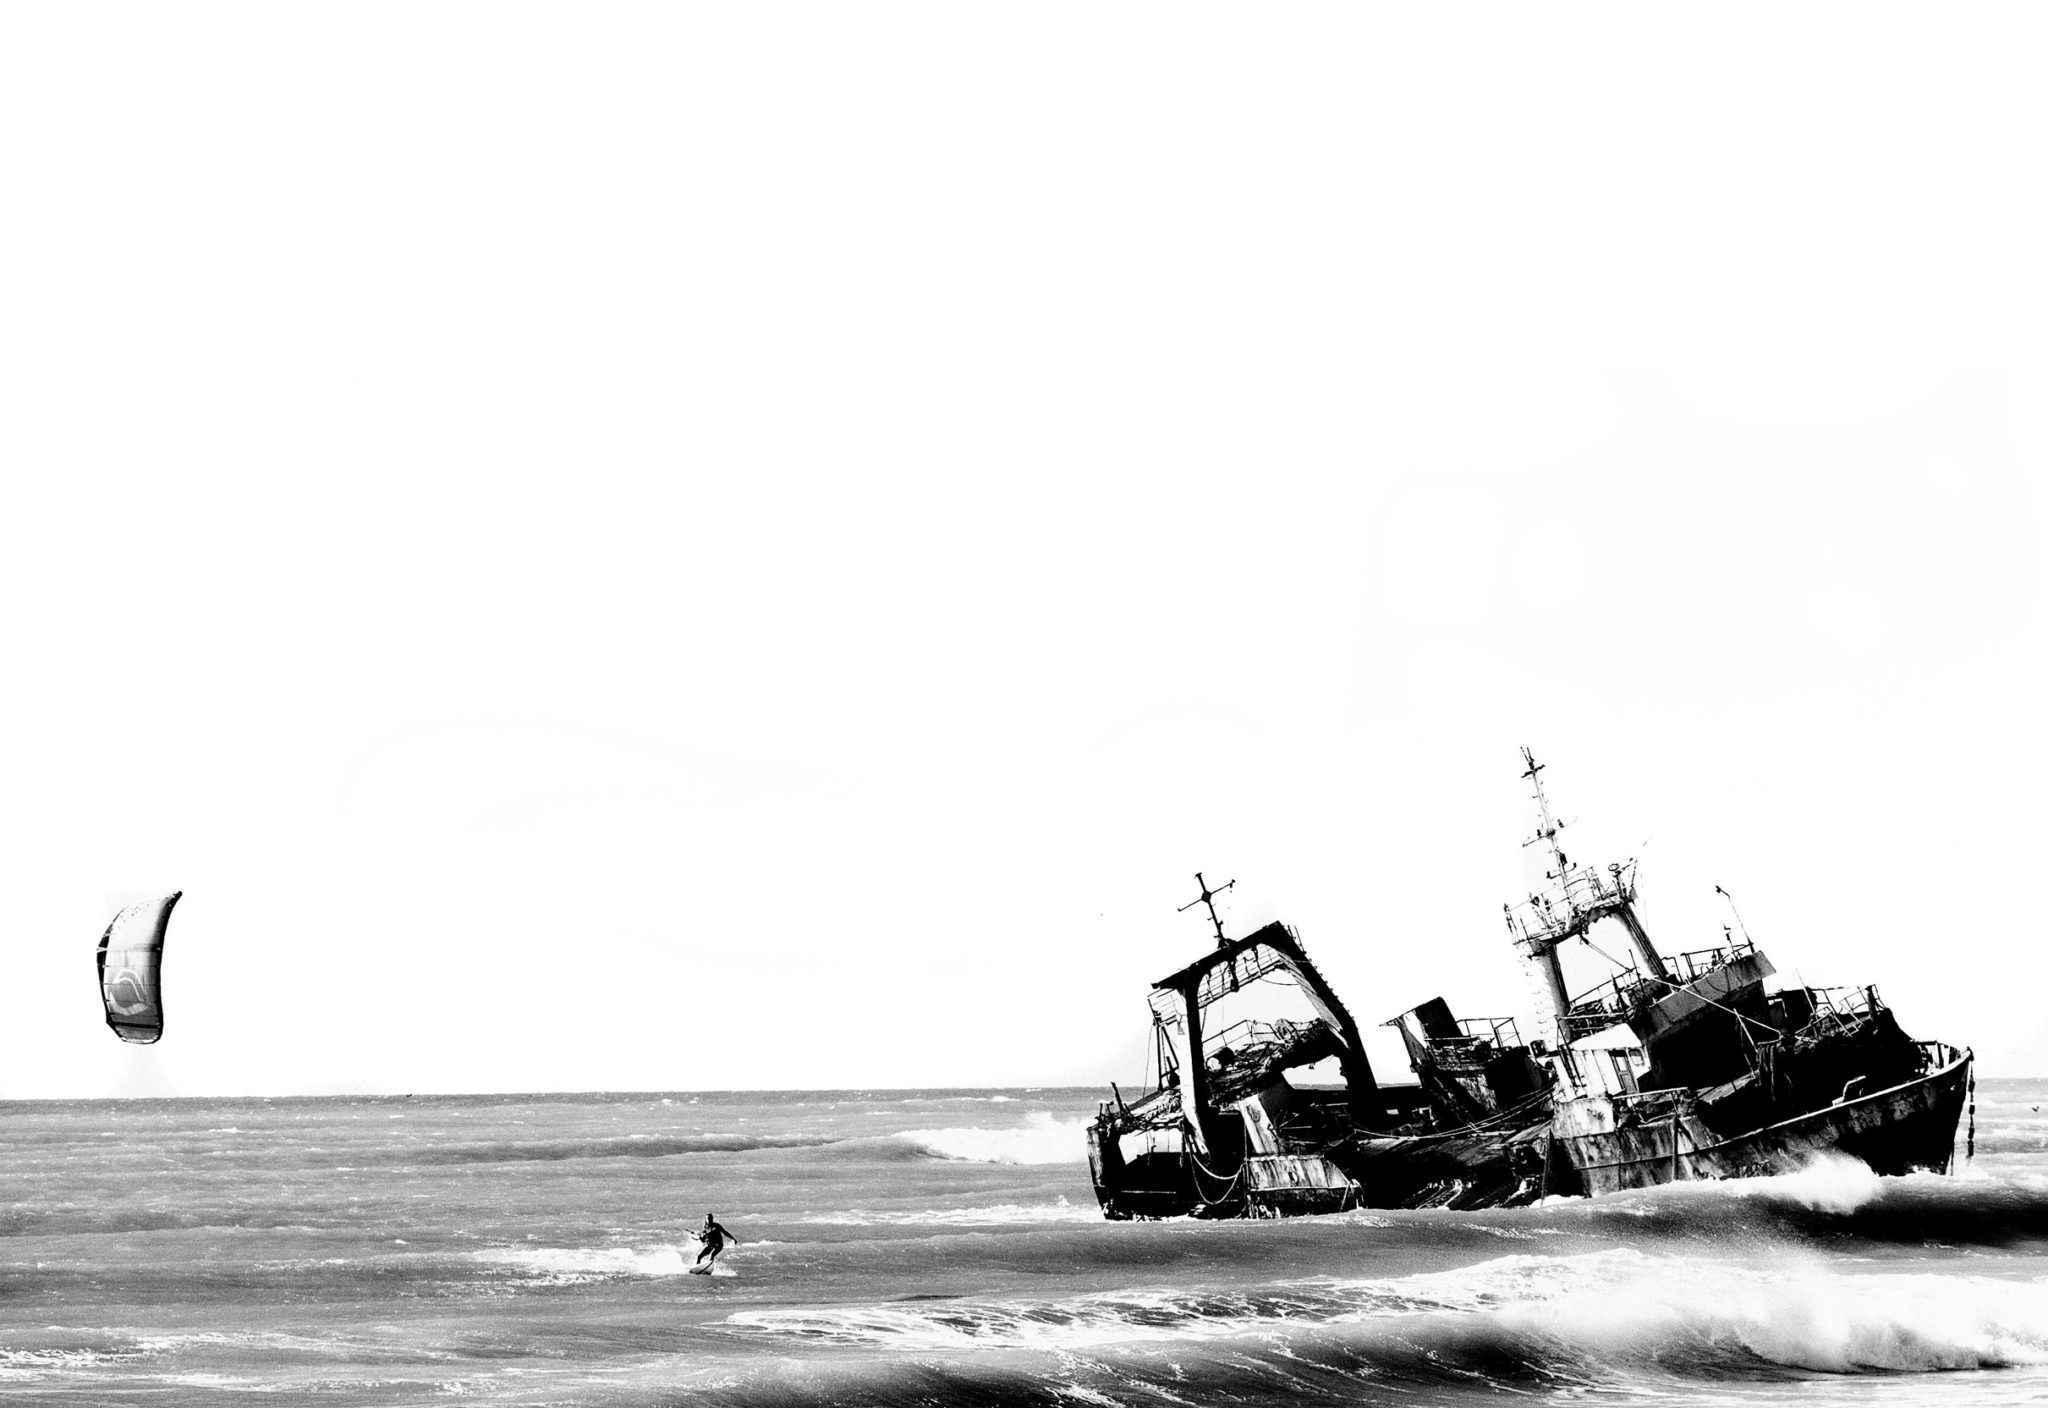 kitesurf Ocean